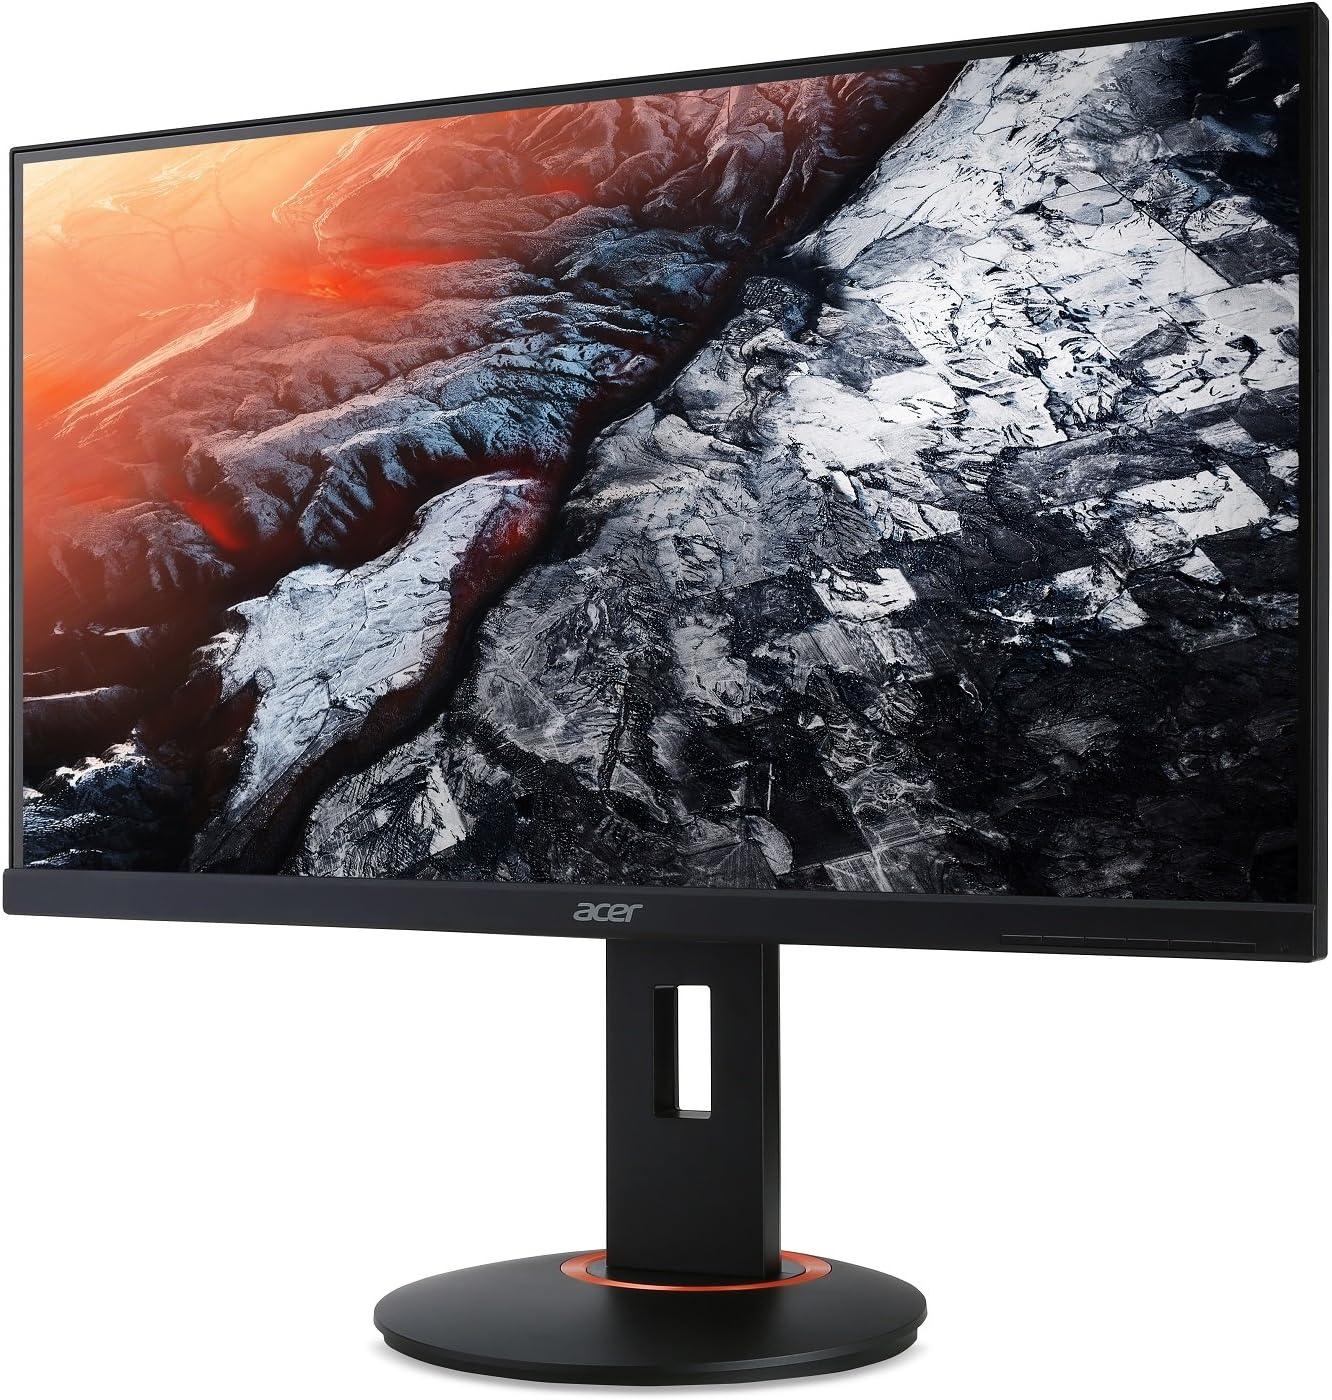 ",Black Acer Gaming Monitor 27/"" XF270H Abmidprzx 1920 x 1080 240Hz Refresh Rate AMD FREESYNC Technology Display Port, HDMI /& DVI Ports"